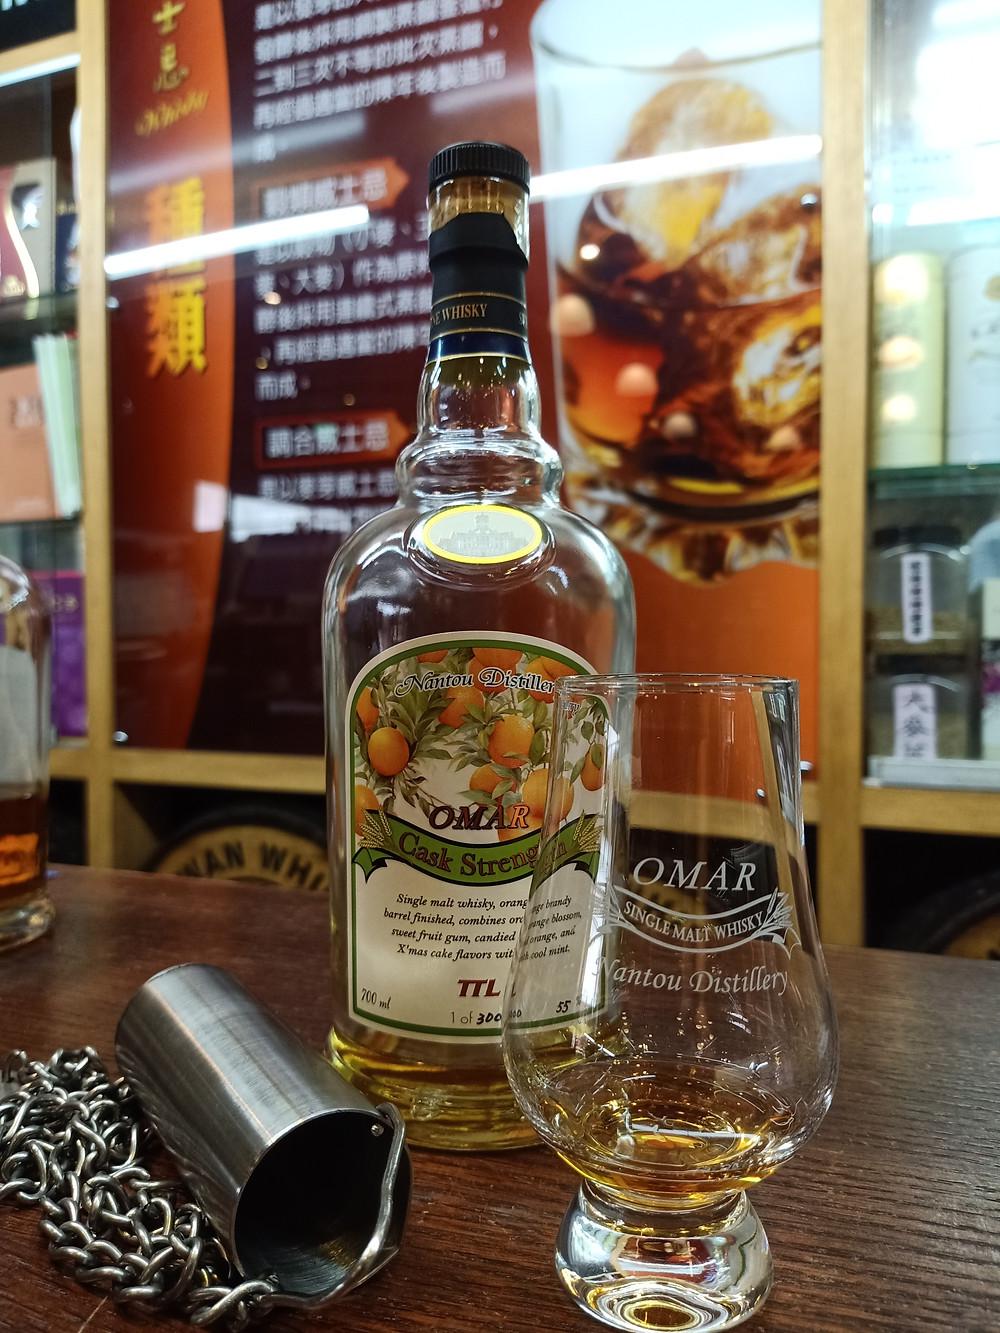 Kavalan Peaty Cask Whisky Flacon at Taroko Gorge